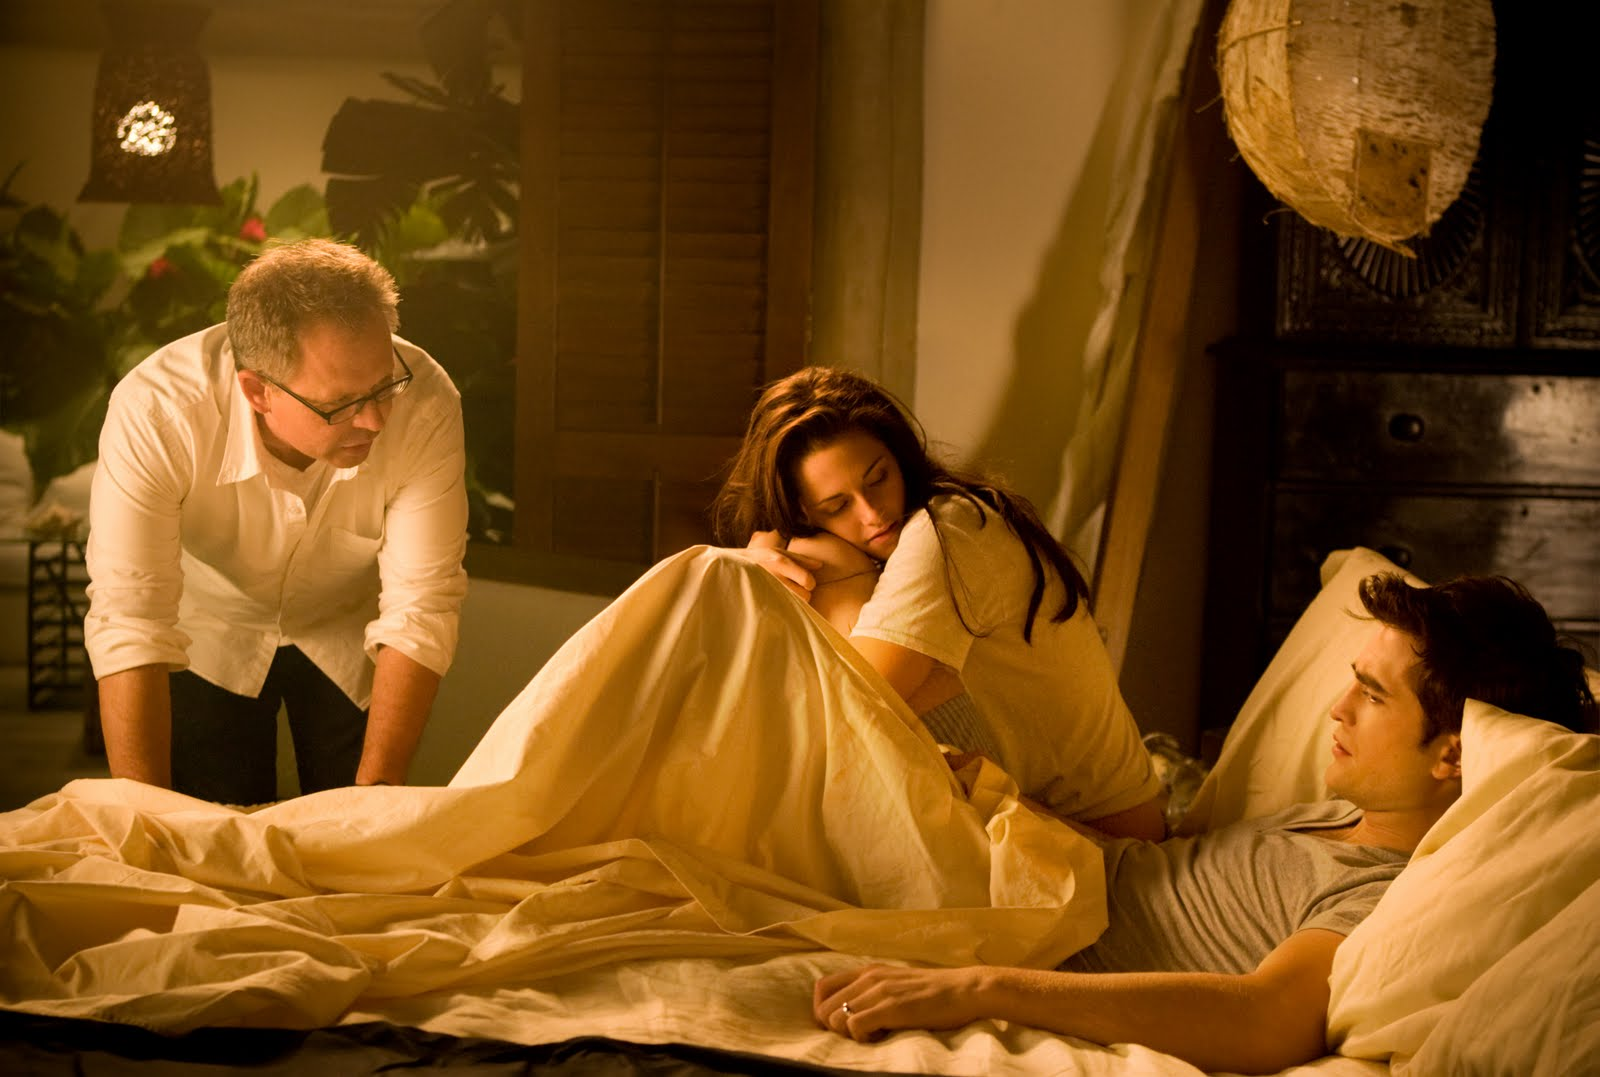 http://4.bp.blogspot.com/-g9jG88O8aiw/Tk1n-j53jYI/AAAAAAAABTo/StIbtBKAd1s/s1600/Robert-Pattinson-Kristen-Stewart-Twilight-Saga-Breaking-Dawn-Part-1-image-3.jpg